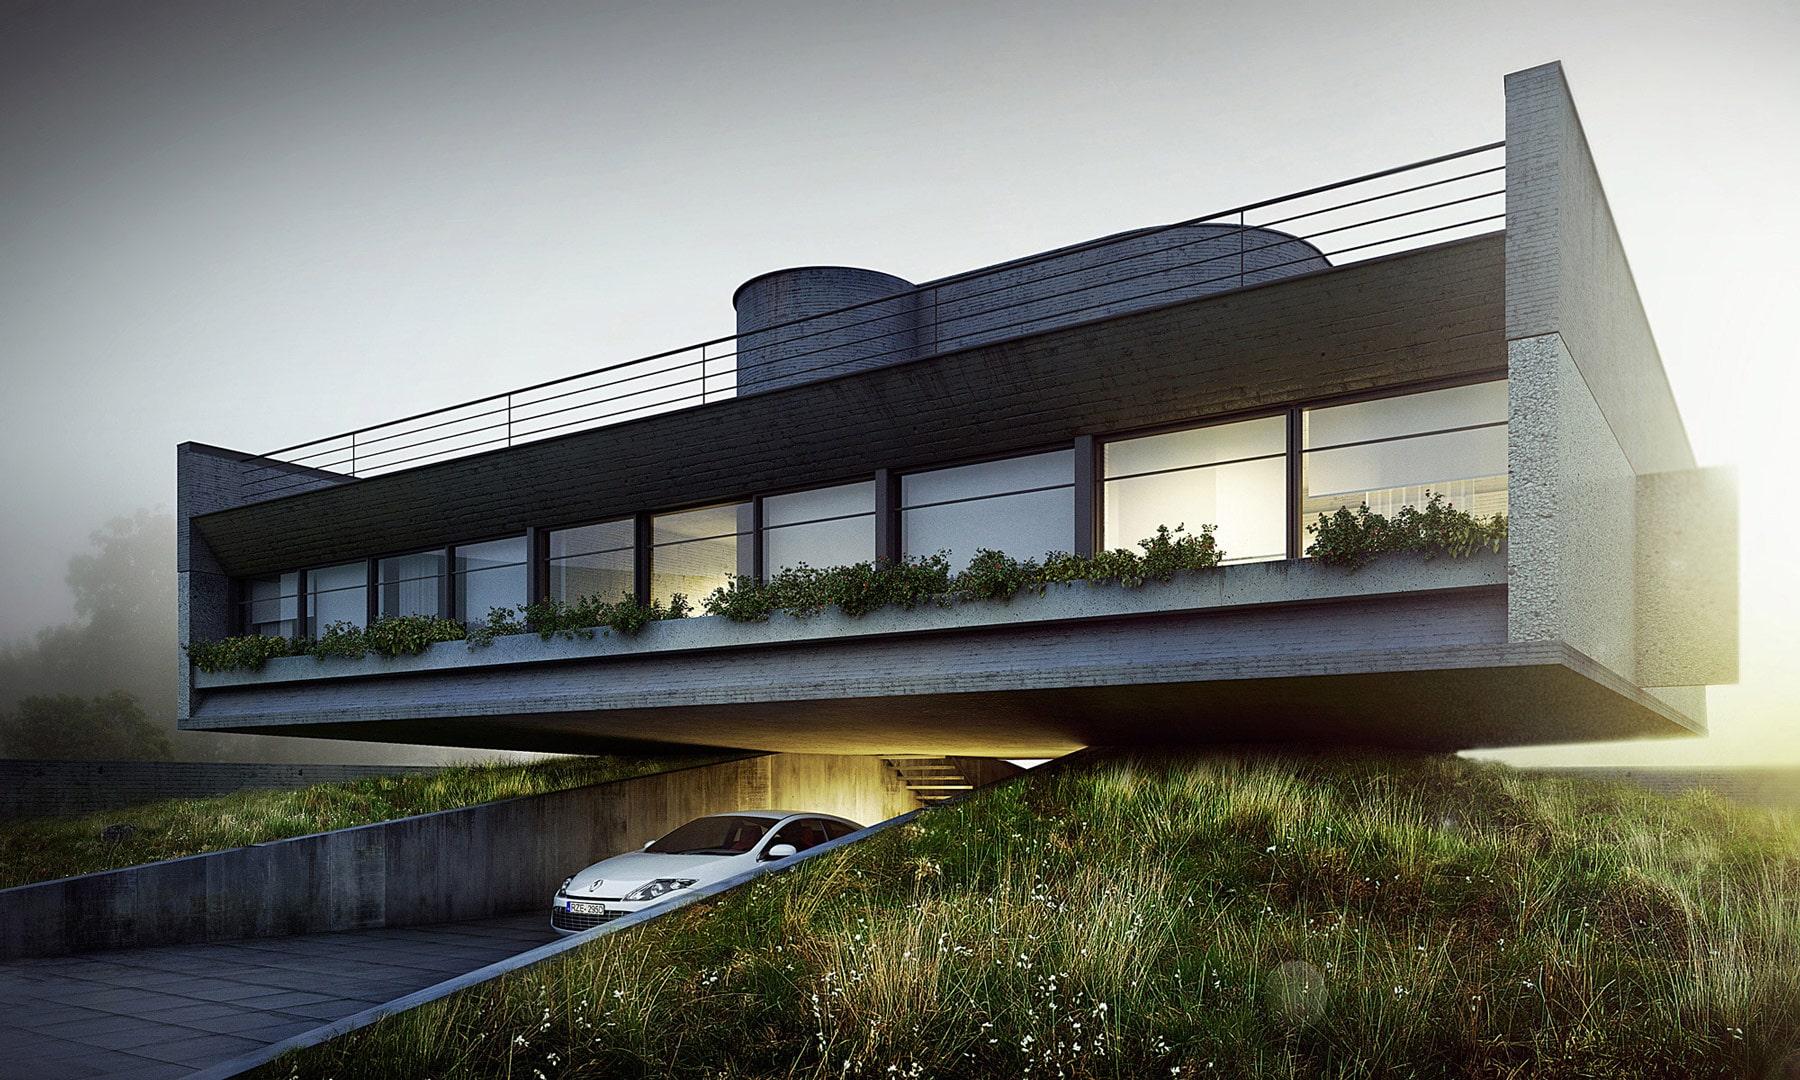 exterior design of building